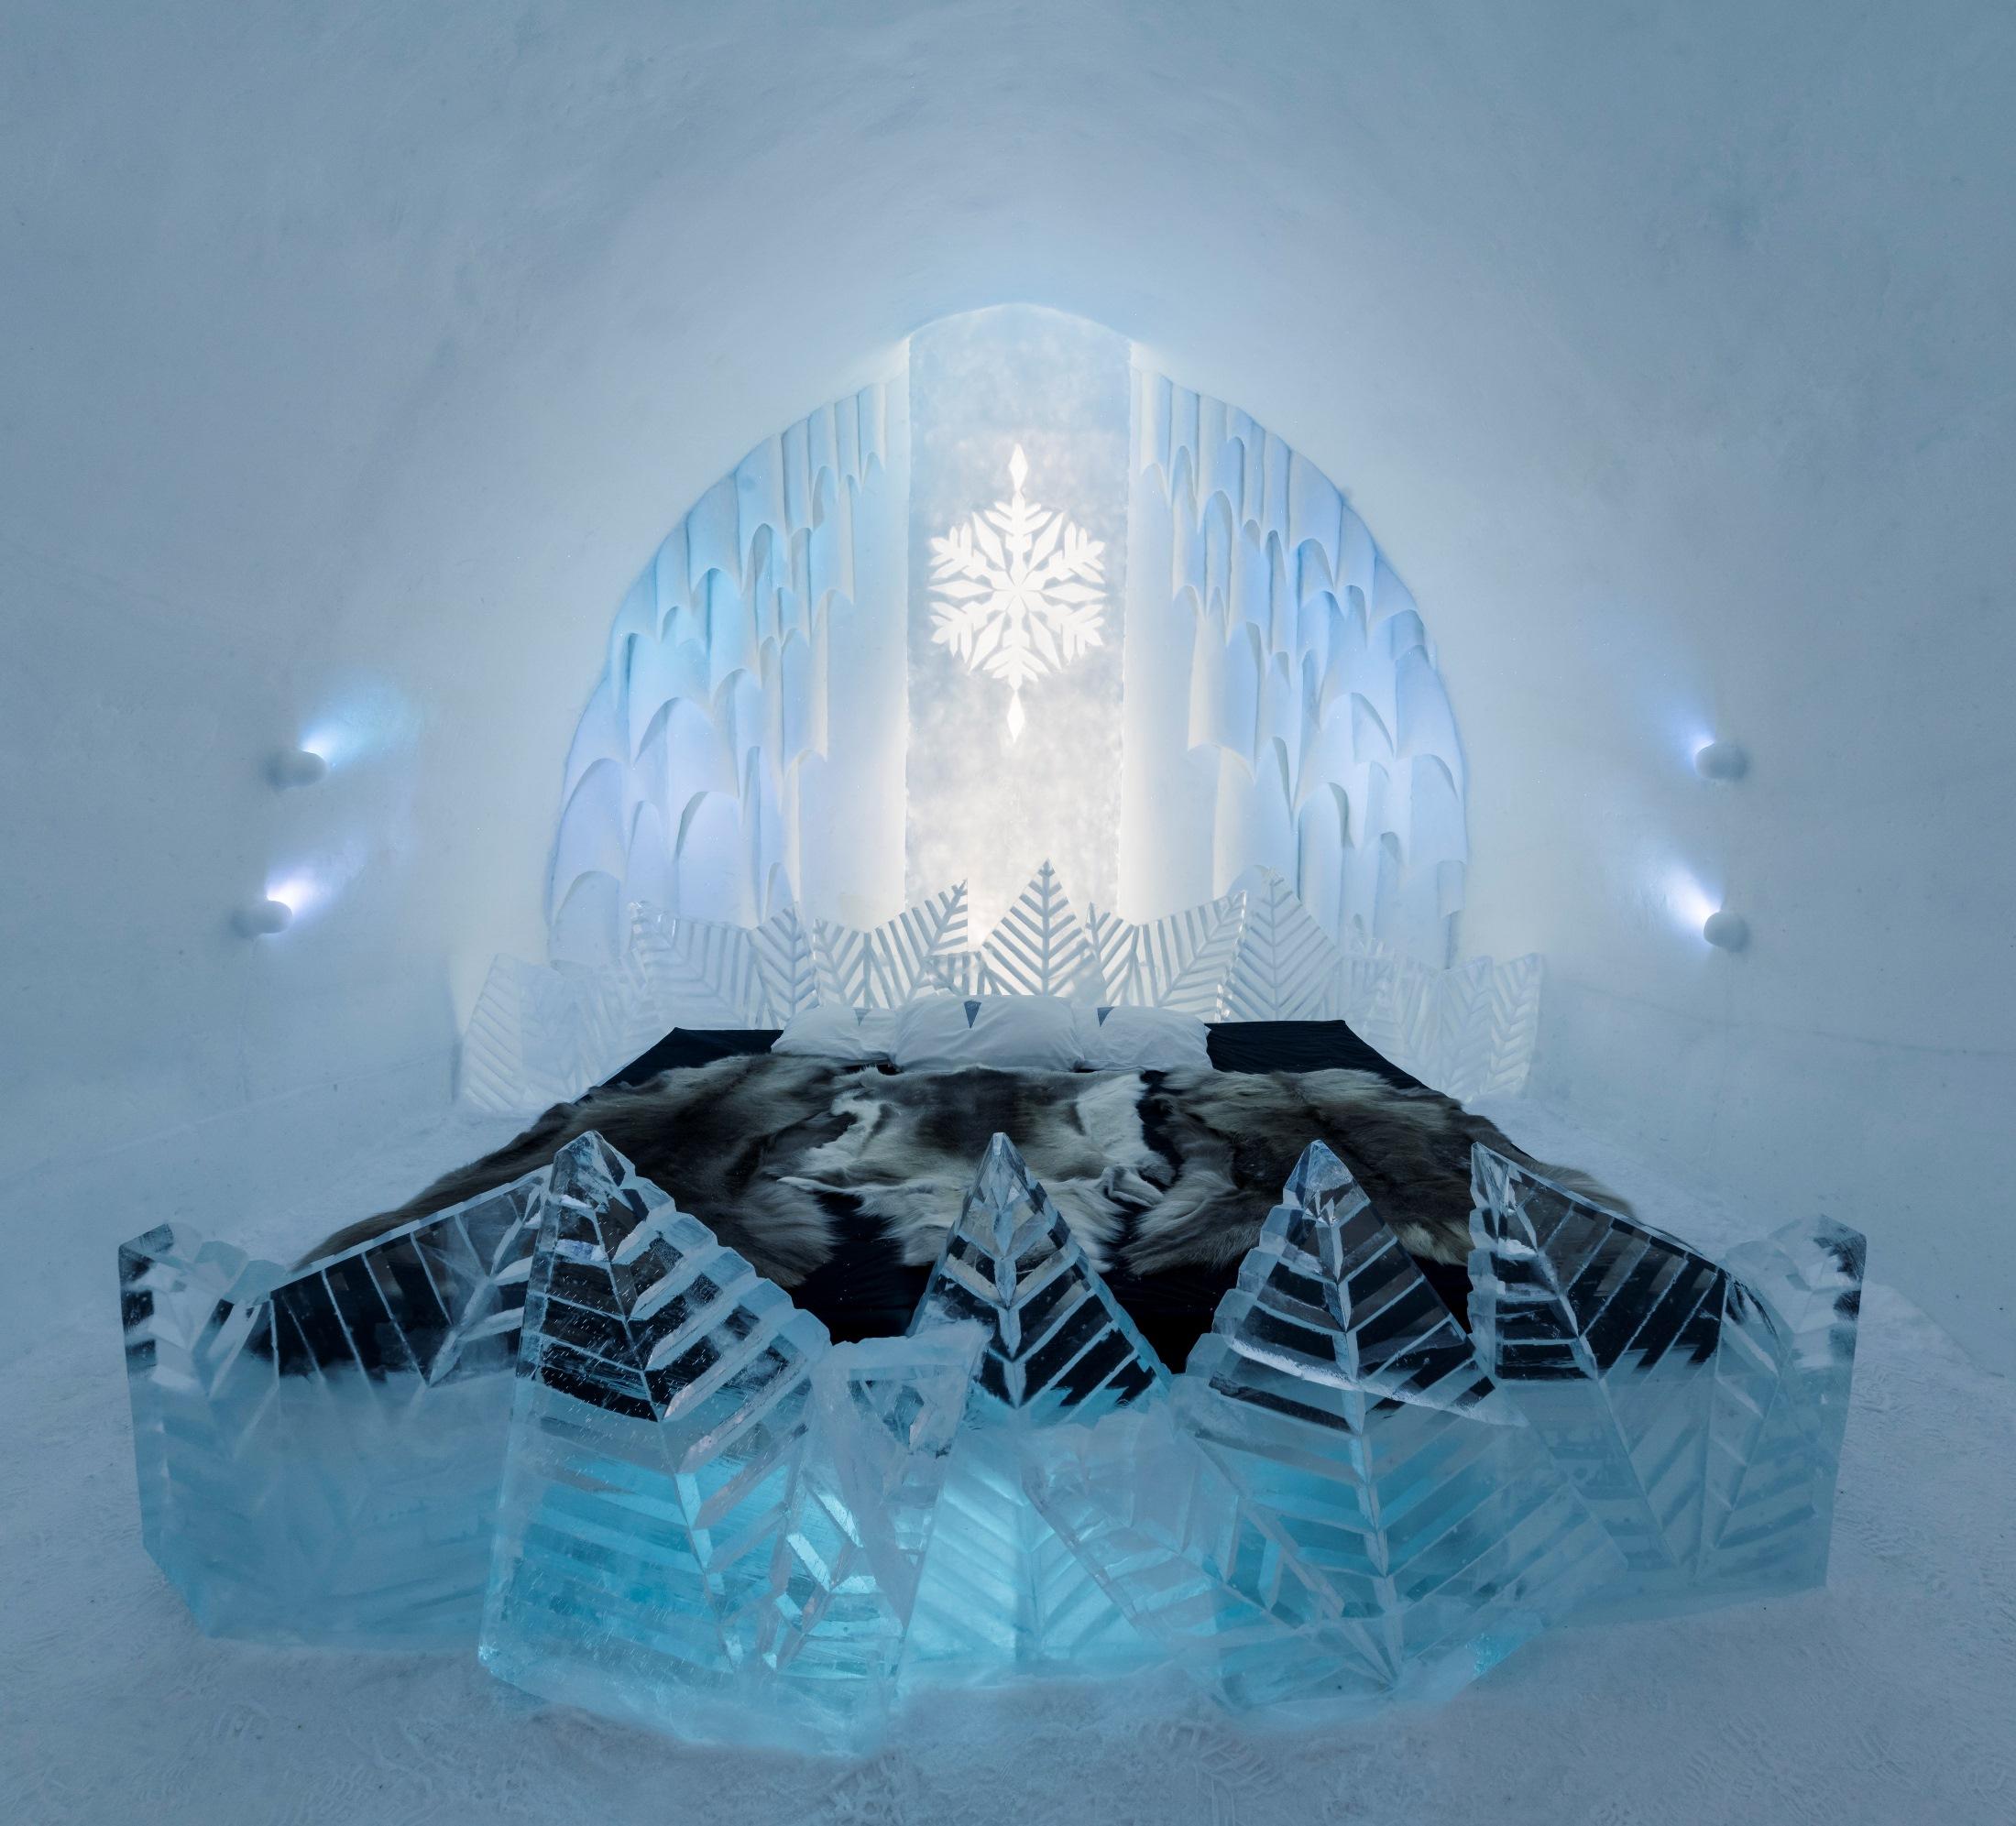 Ice Hotel 2013/2014, suite by Natuski Saito and Shingo Saito